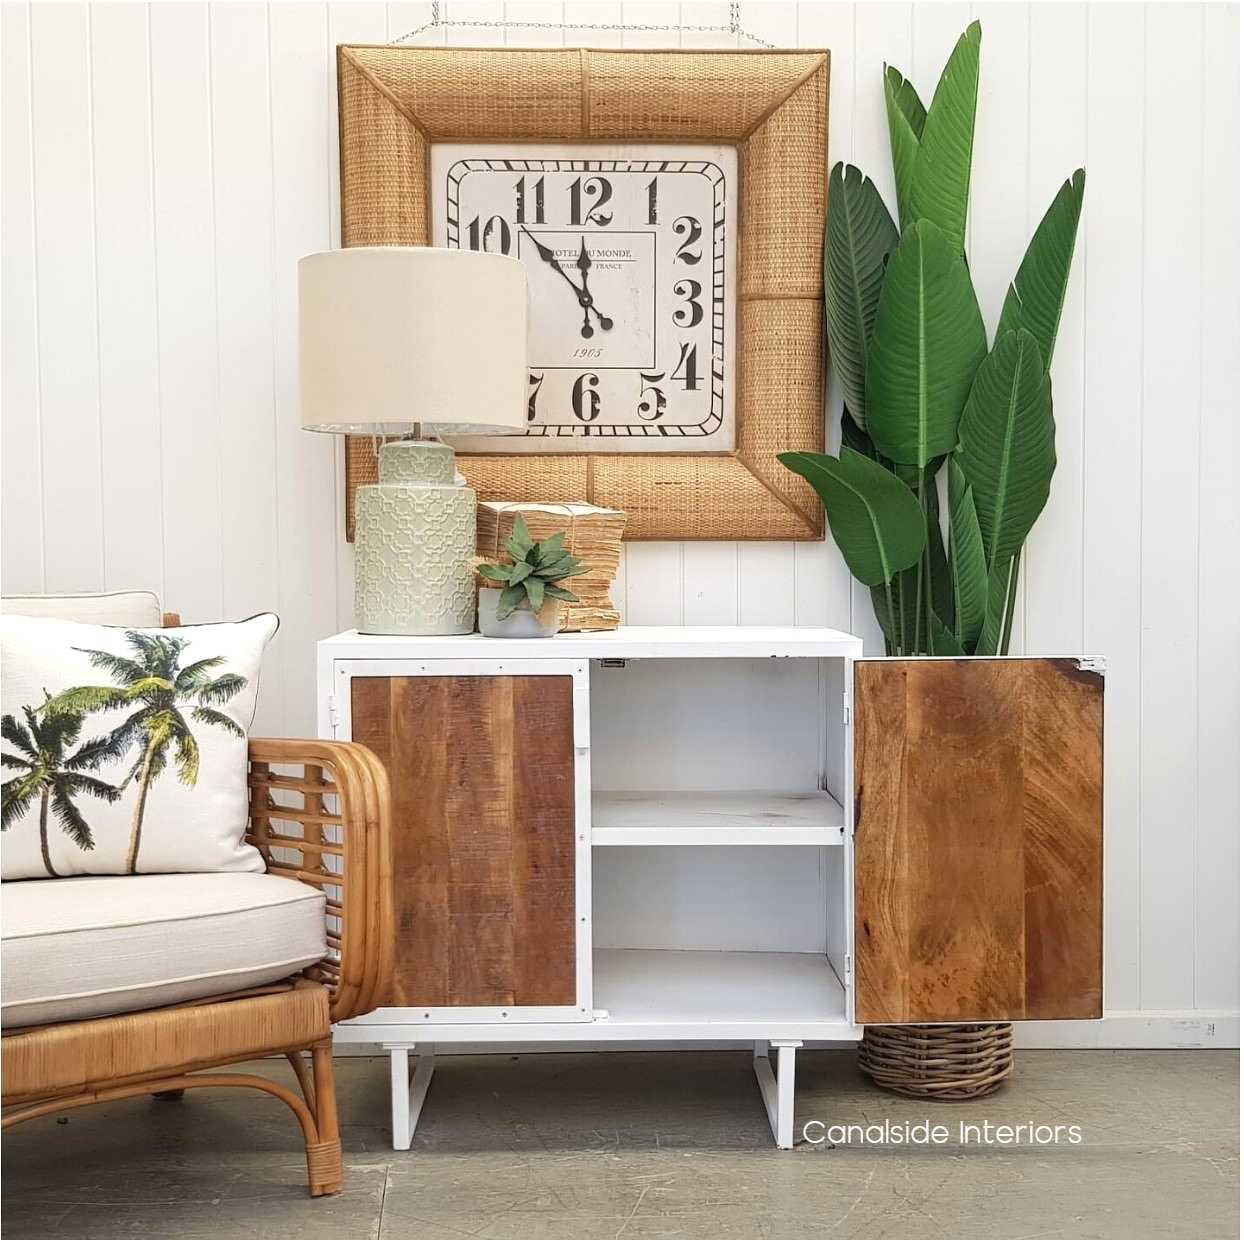 Ellaria Sideboard  INDUSTRIAL RUSTIC Style, CAFE FURNITURE, LIVING Room, LIVING TV Media & Storage, CAFE FURNITURE Storage, TABLES Sideboards & Buffets, STORAGE, STORAGE Sideboards & Buffets, PLANTATION STYLE